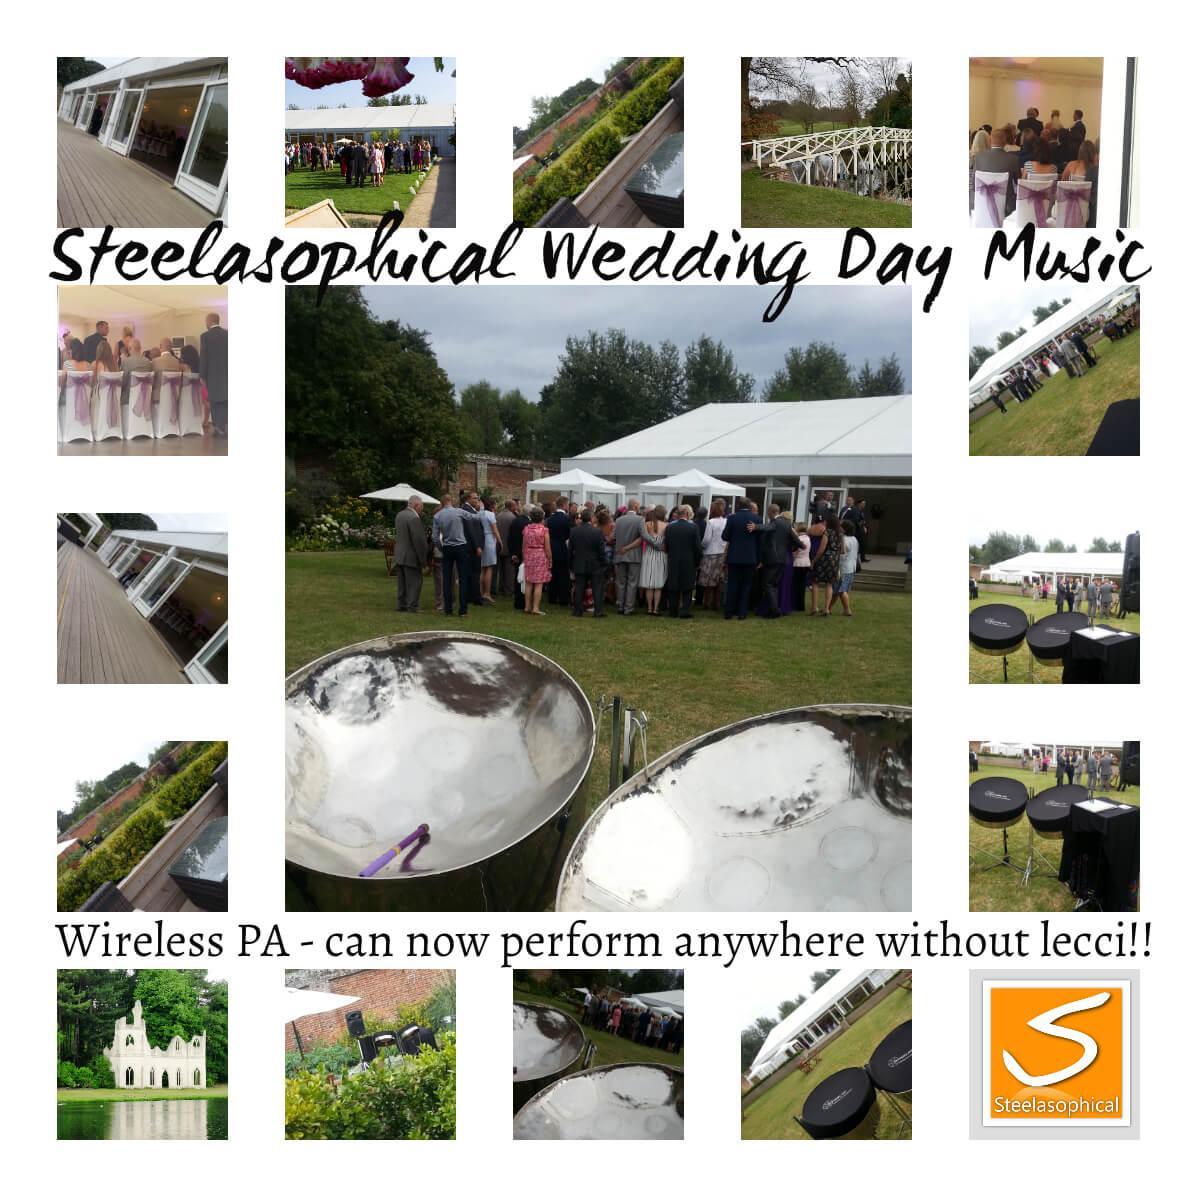 Steelasophical steelband steelpan wedding day music ceremony drinks reception wedding breakfast evening dancing